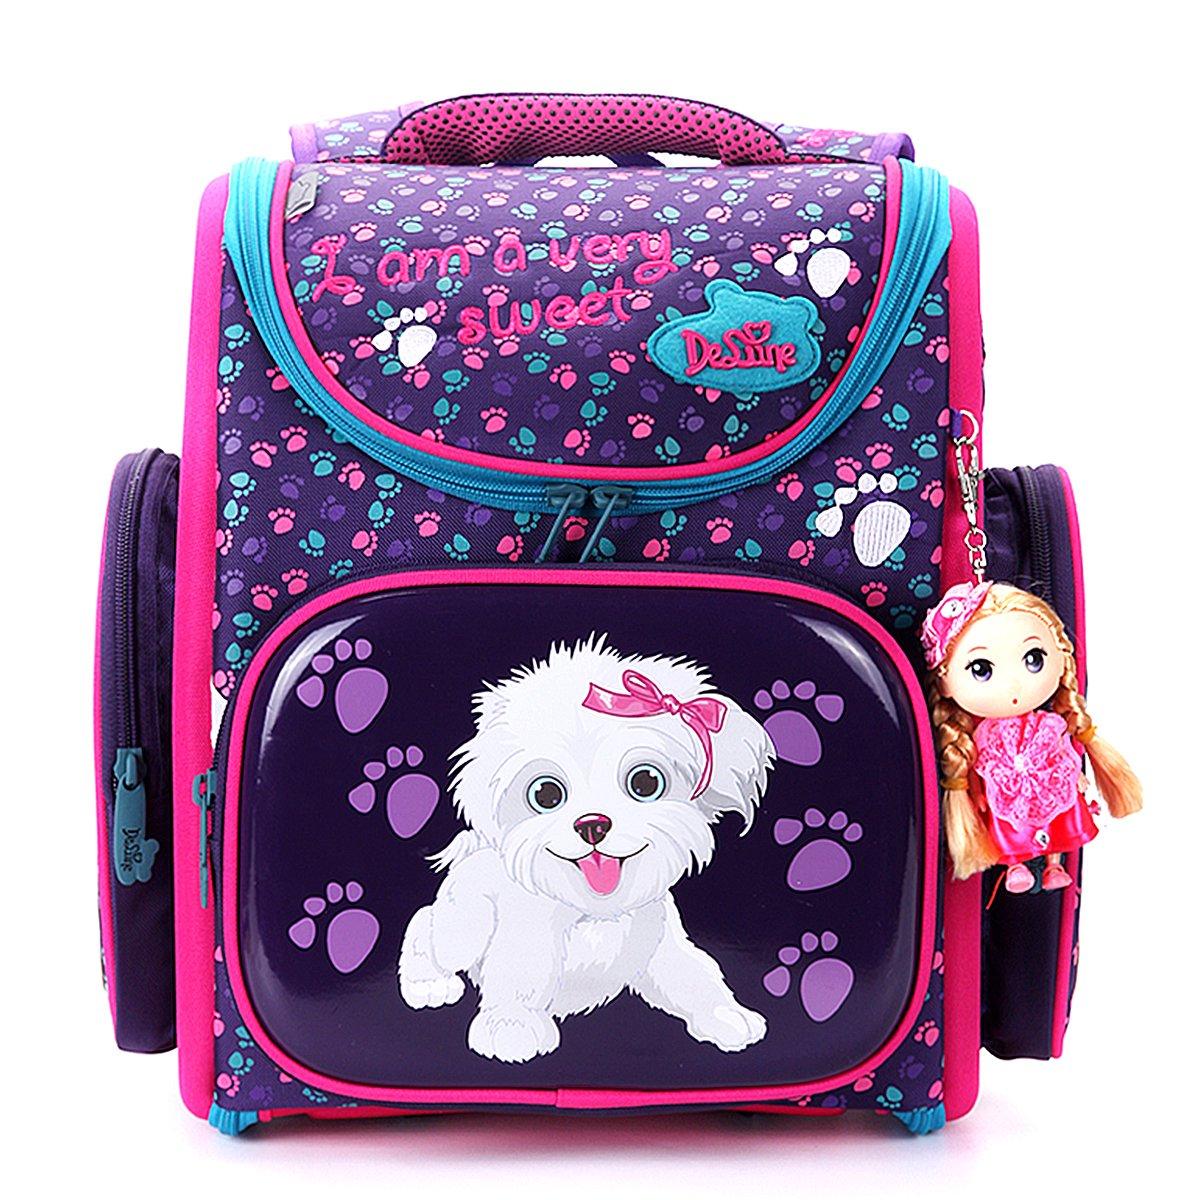 Kidsバックパックfor Girls and Boysキュートスクールバッグ – 防水/ユニーク/ノーブル B0744JFP7G 3-129